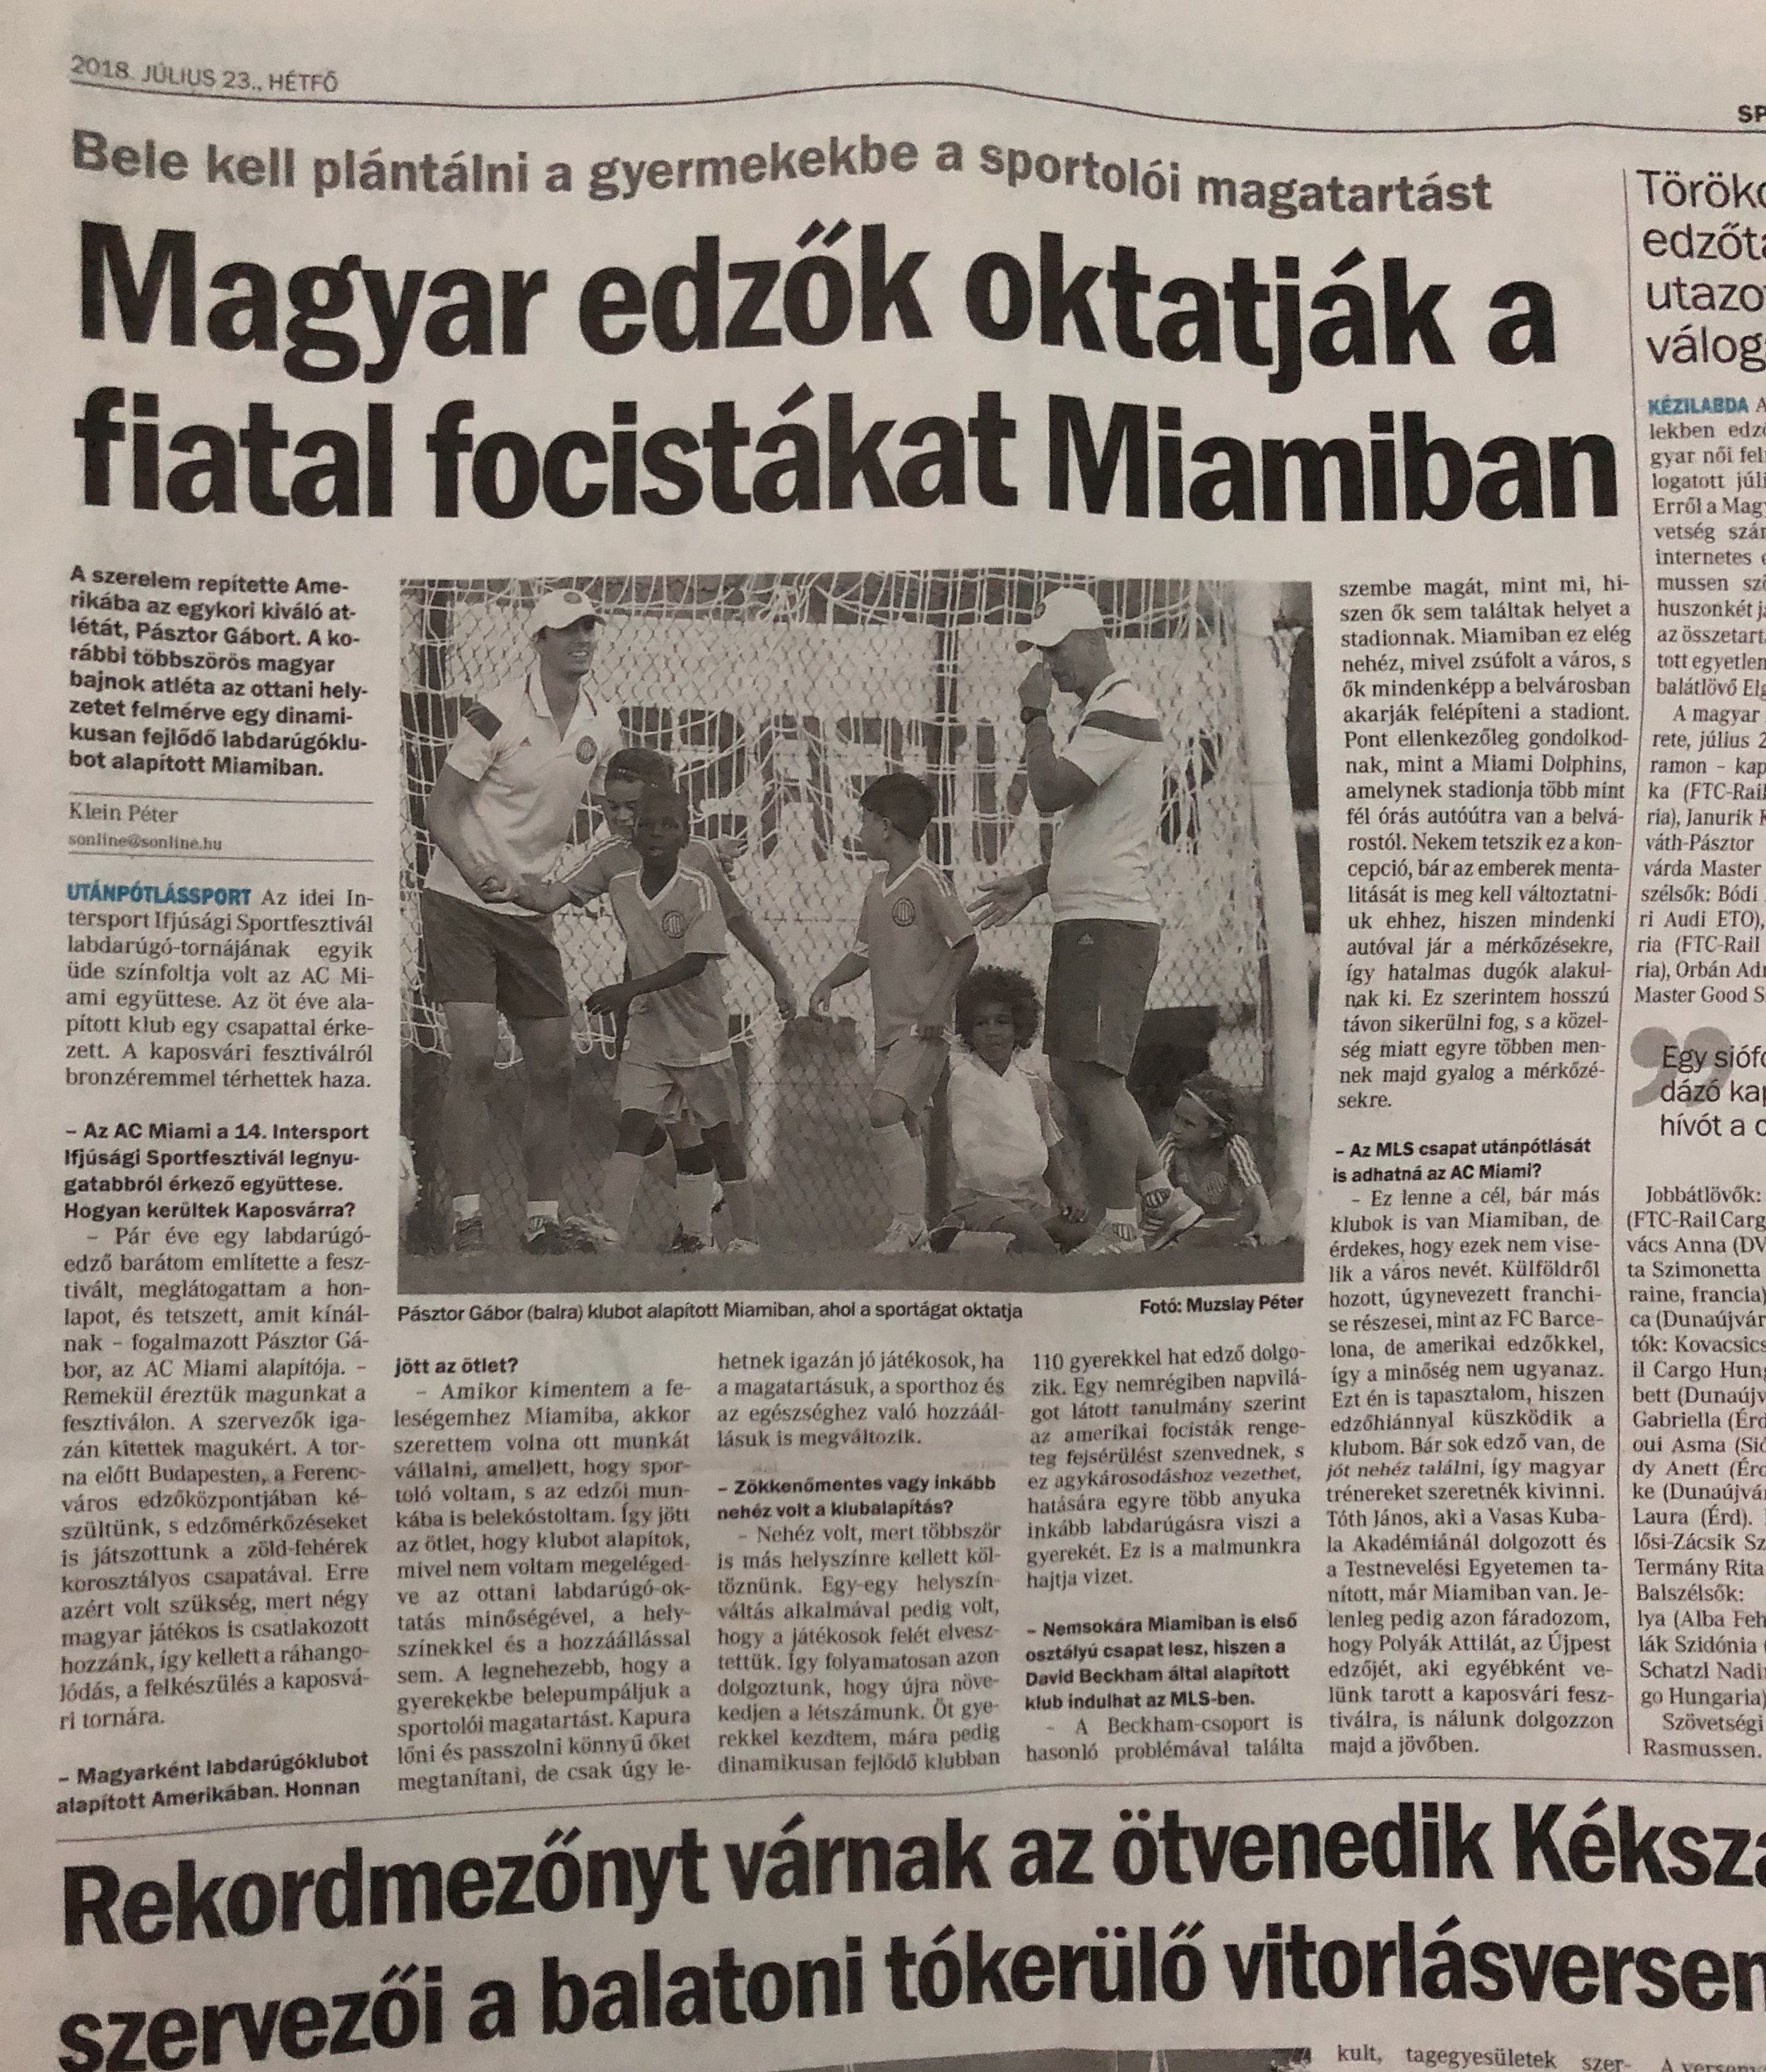 Athletic Club Miami - Kaposvar Intersport Youth Soccer Festival 2018 copy.jpeg